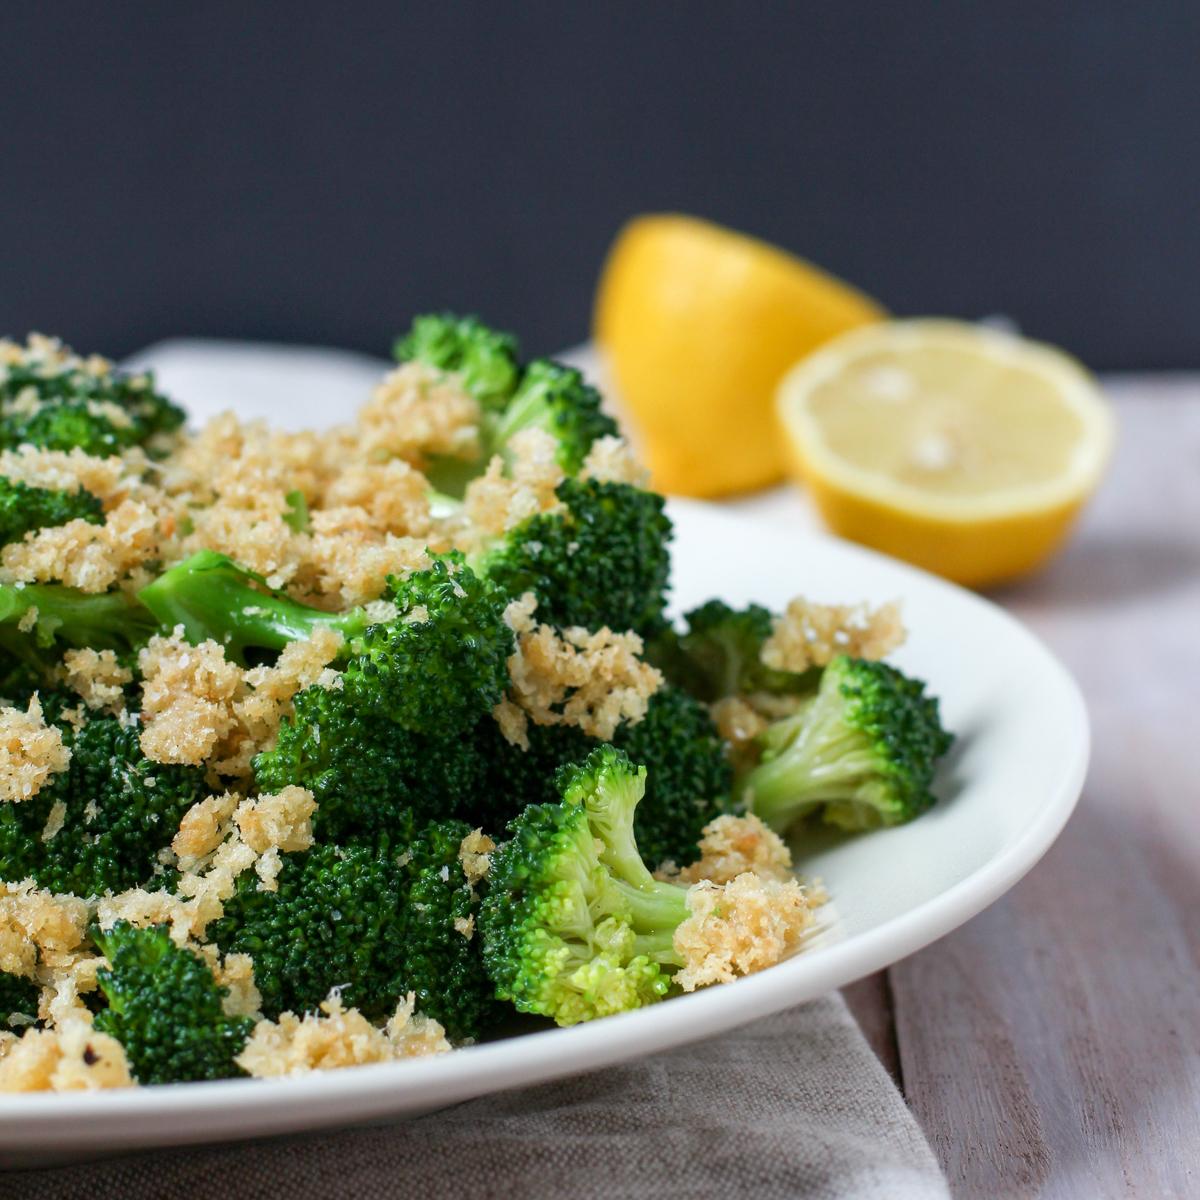 lemon-garlic-broccoli-square.jpg